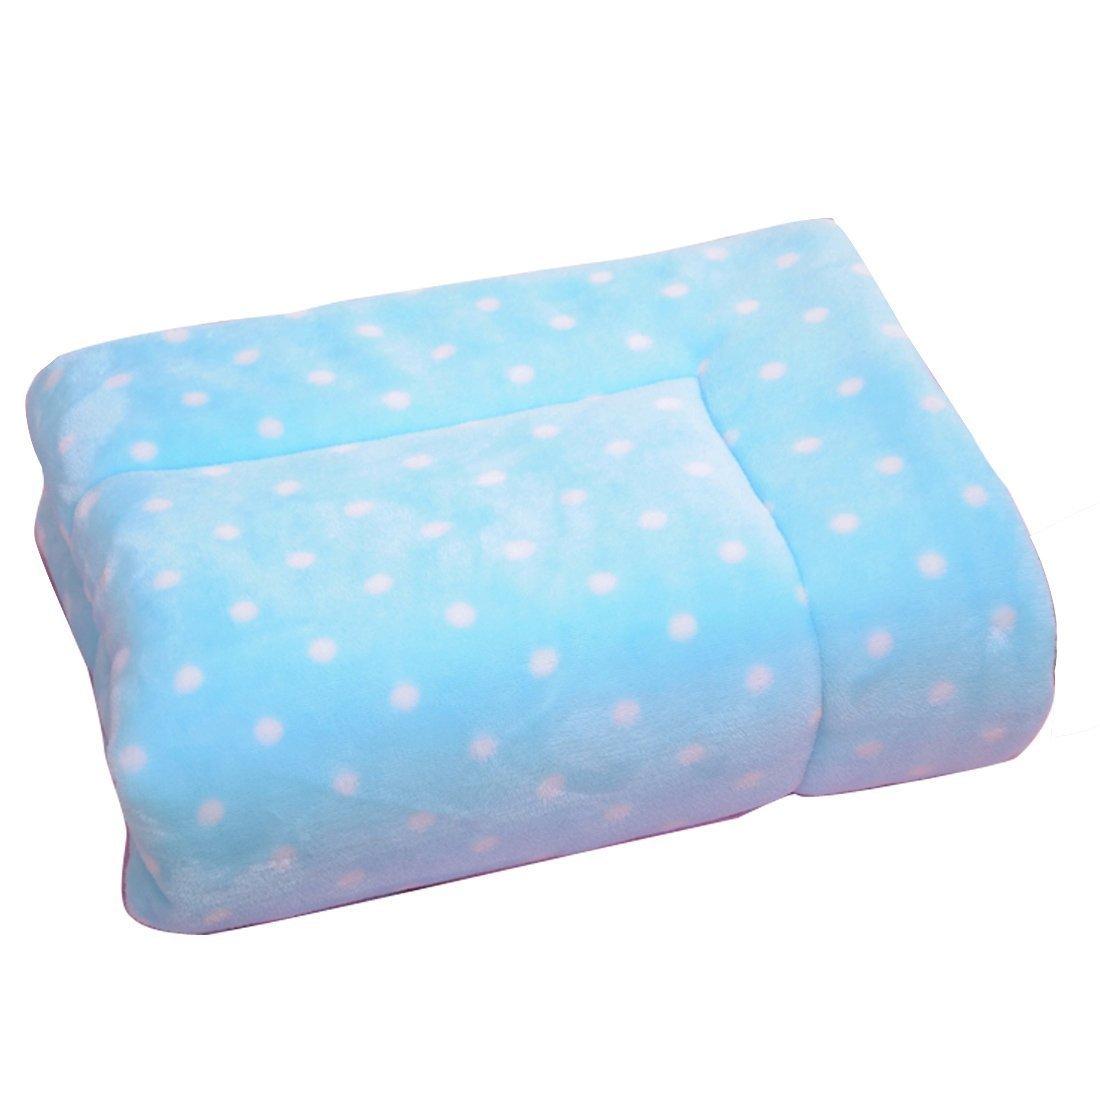 OHlive Accogliente Coperta in Pile per Cani Pet Large Thick Sleeping Mat Mat Cuscino Morbido Winter Warm Washable (Medium)